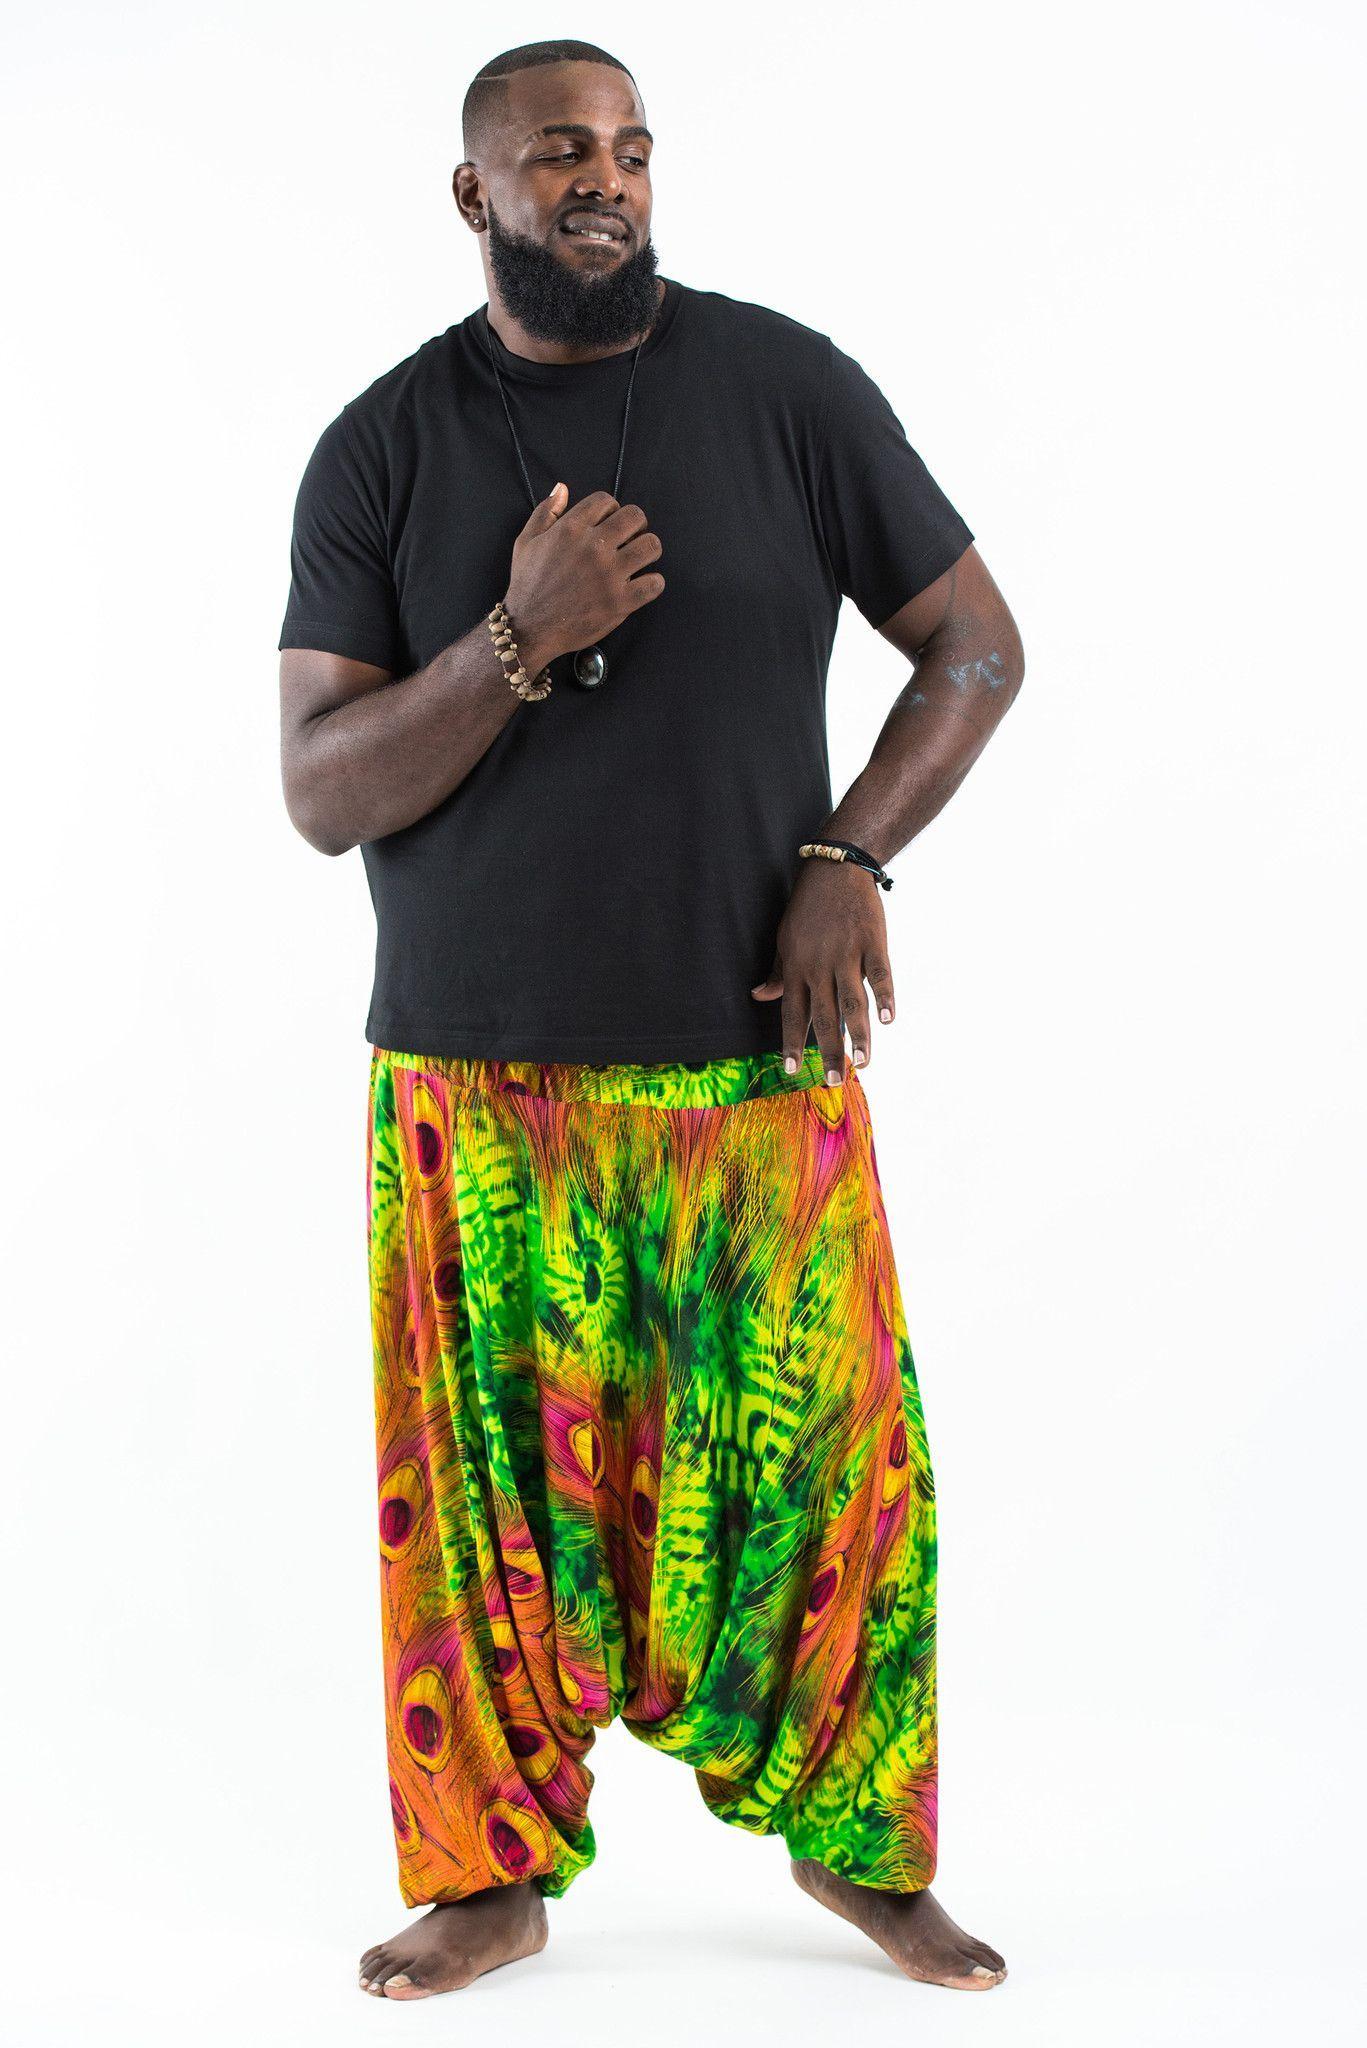 cd6b85e6ffddd Plus Size Tie Dye Peacock Drop Crotch Men s Harem Pants in Green ...